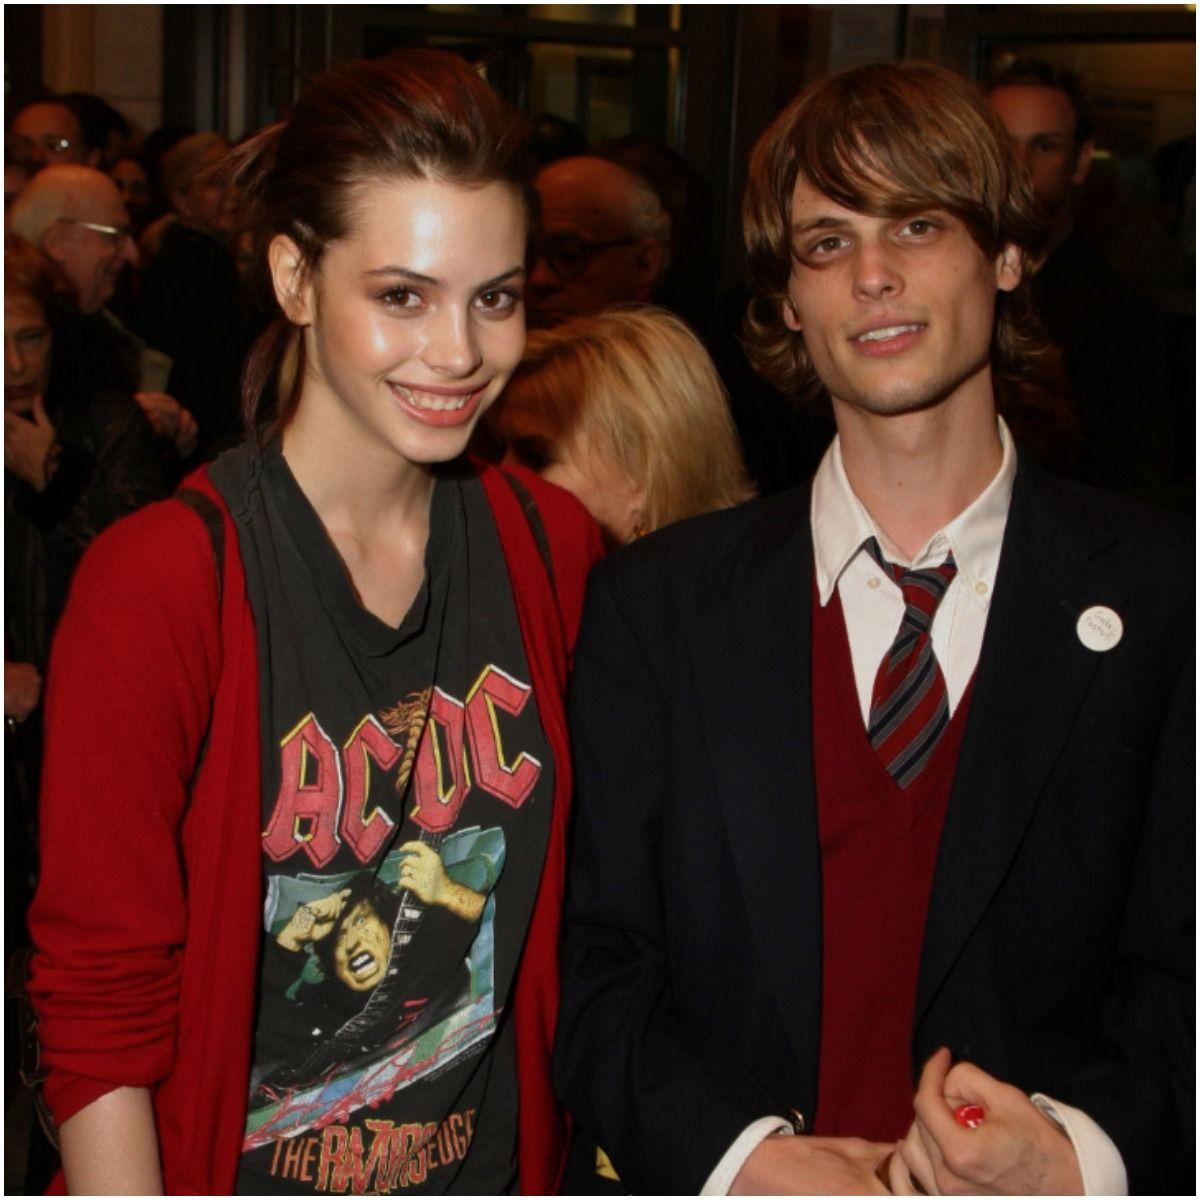 Matthew Gray Gubler with girlfriend Charlotte Kemp Muhl